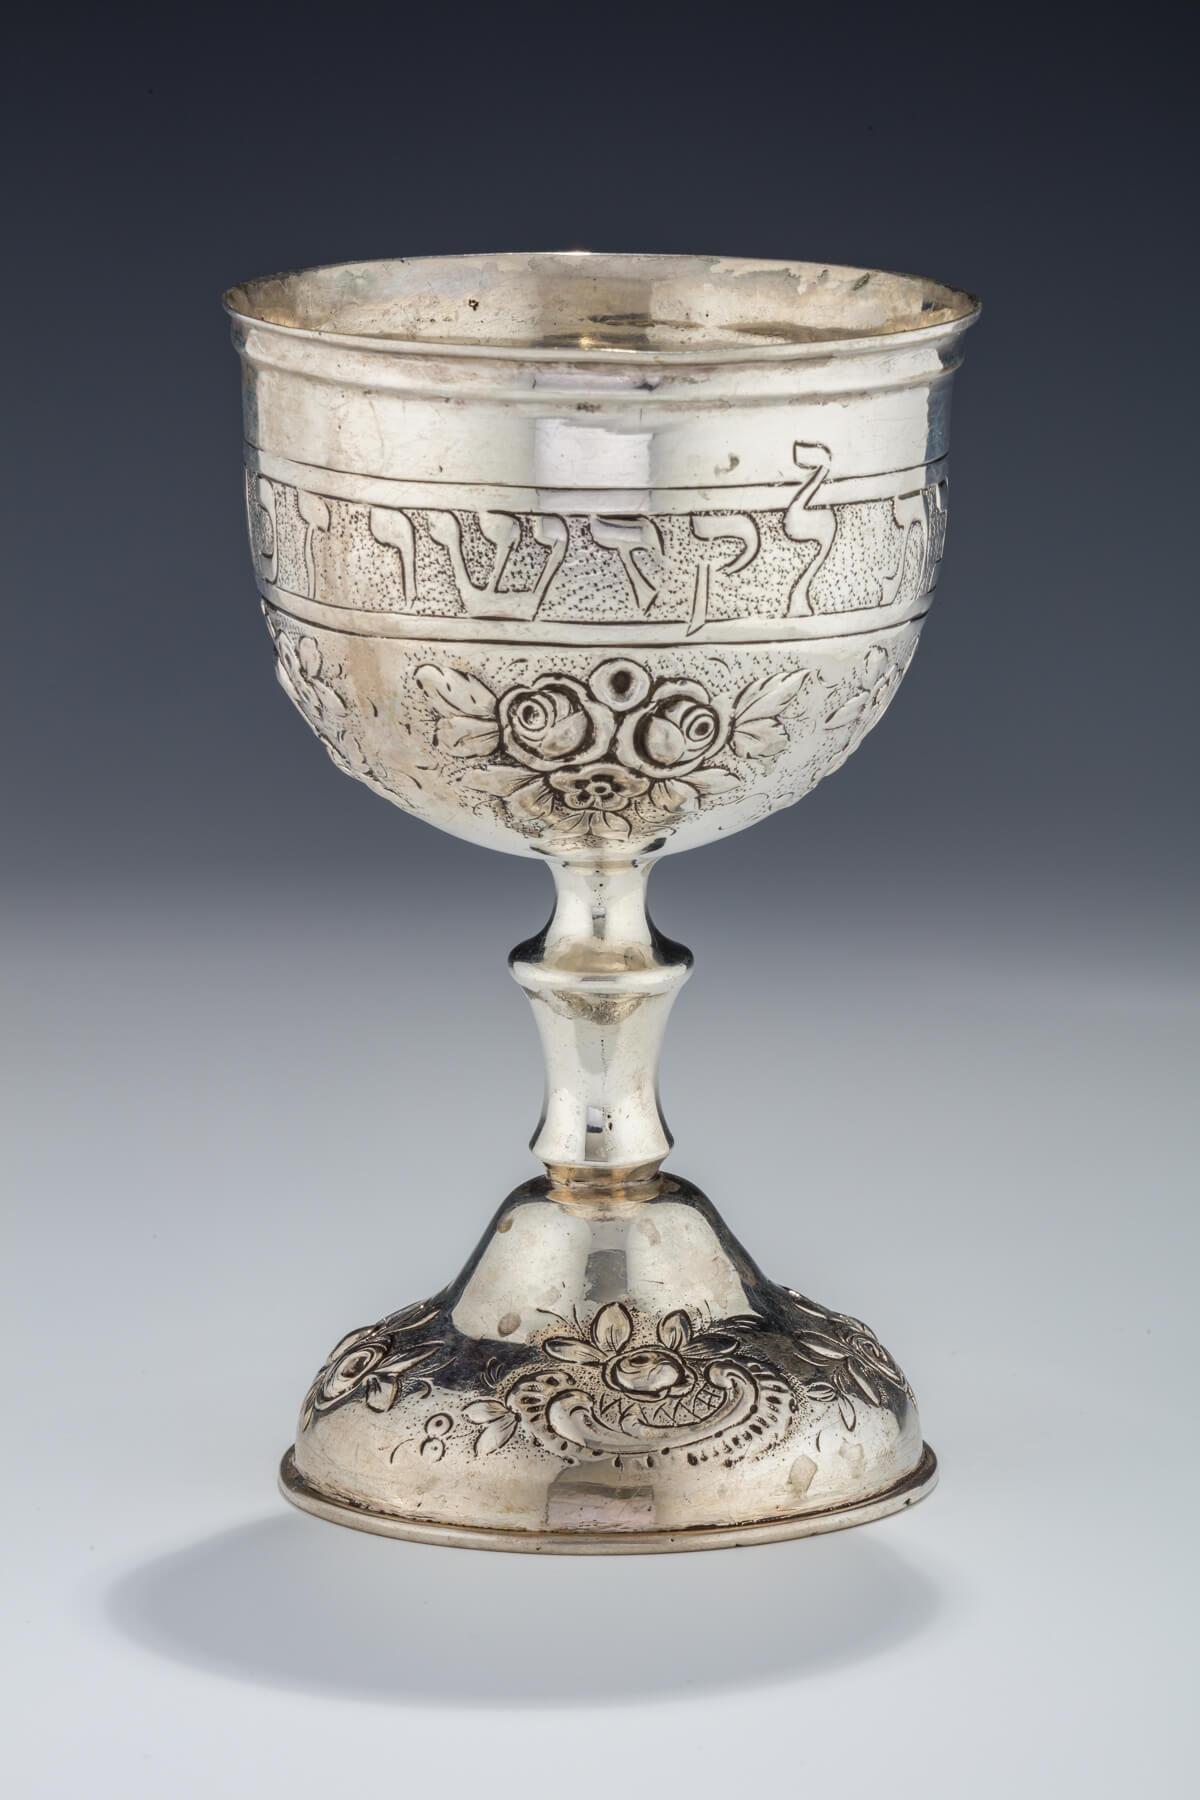 065. A Silver Kiddush Goblet